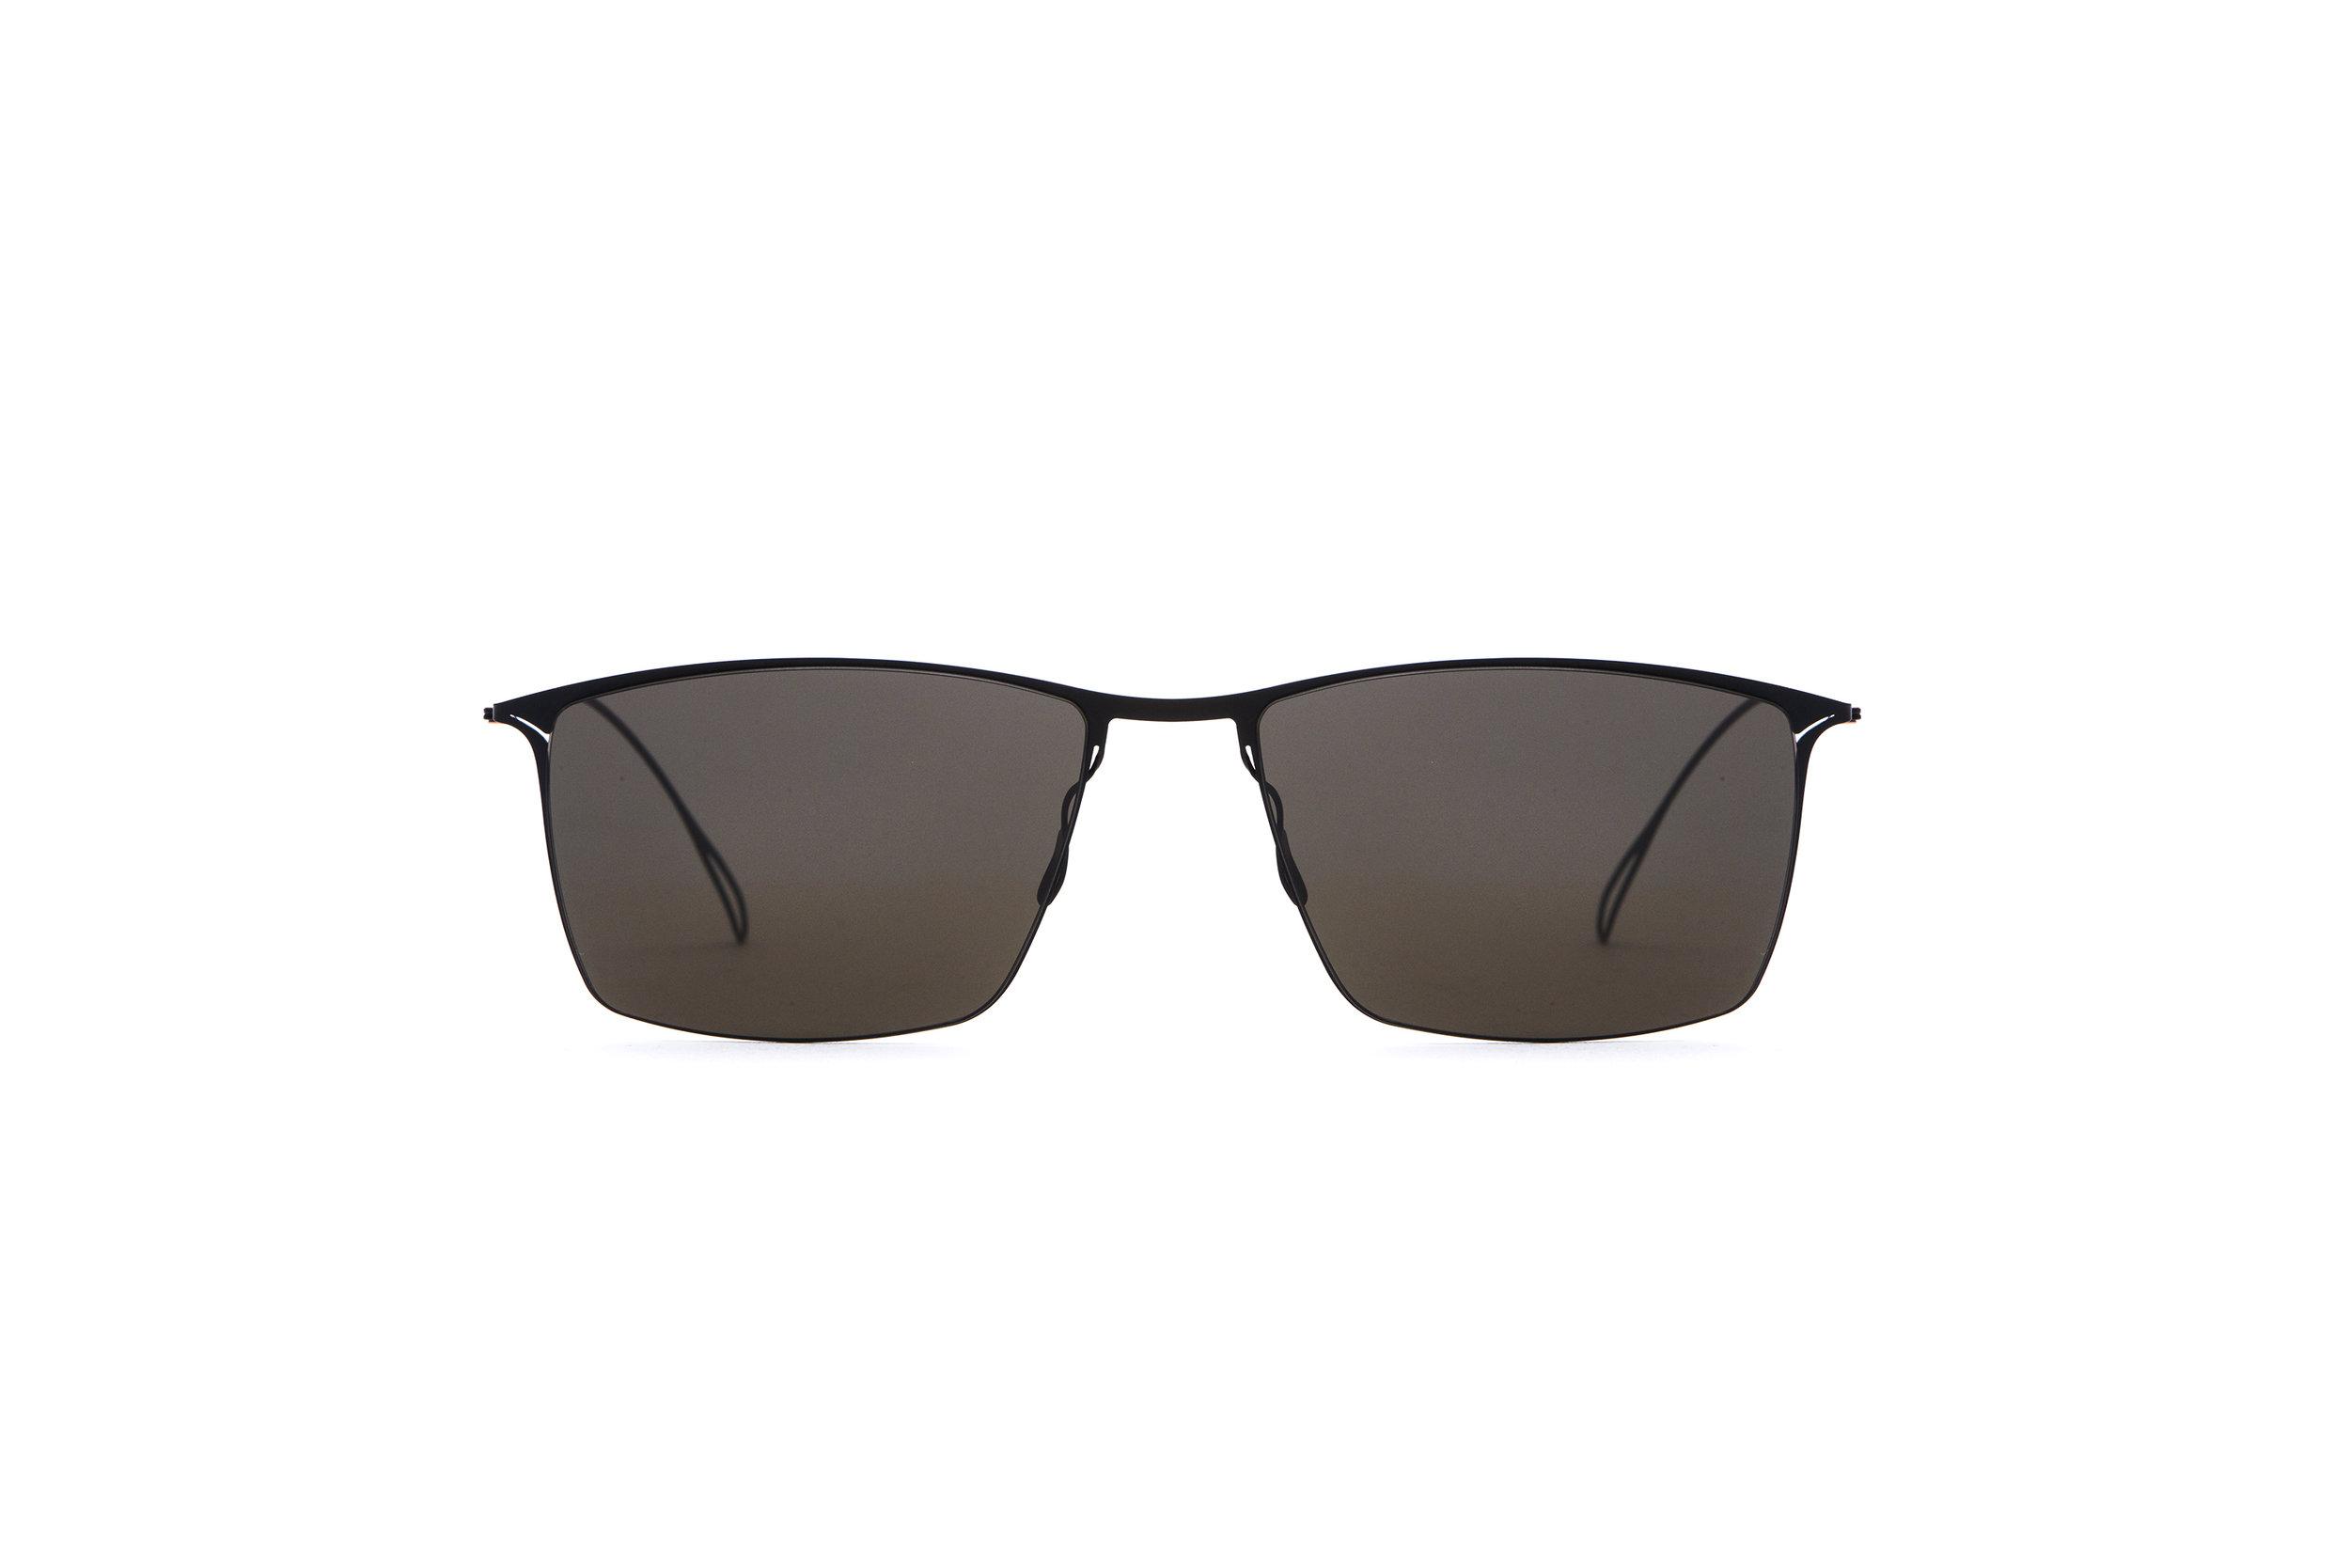 haffmans_neumeister_novik_black_grey_ultralight_sunglasses_front_102449.jpg